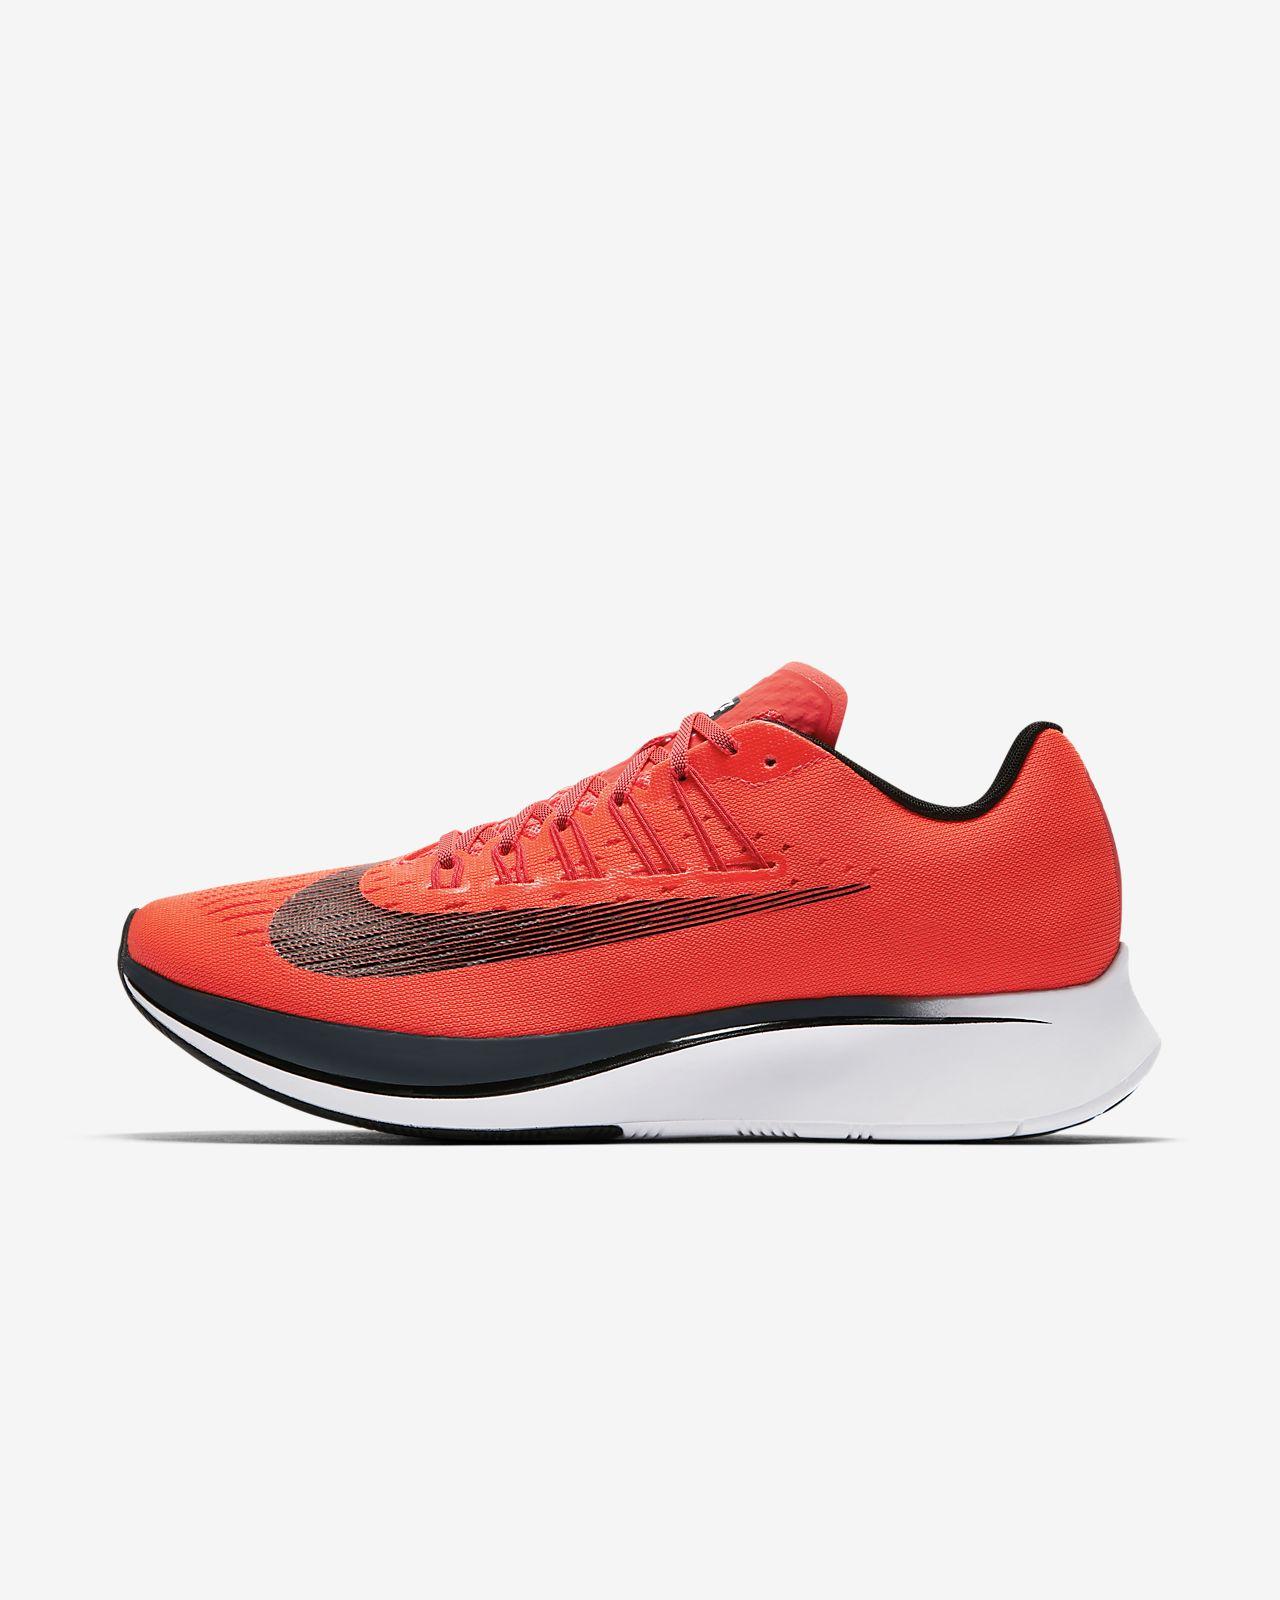 0f045194ebd664 Nike Zoom Fly Herren-Laufschuh. Nike.com CH